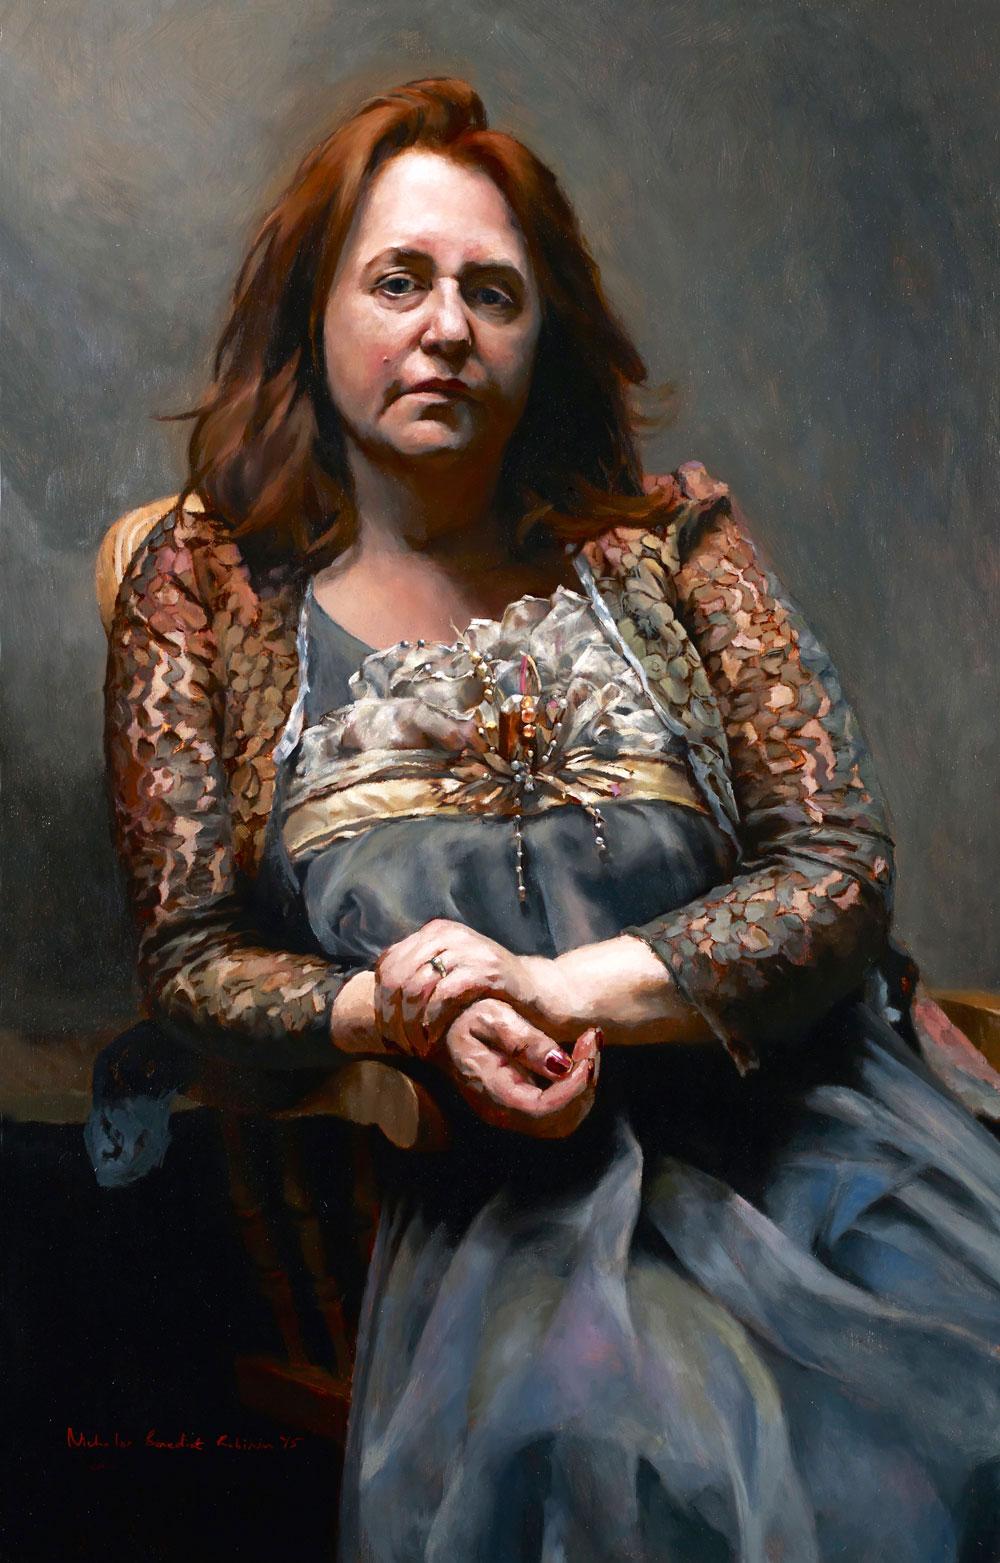 mary-coughlan-portrait.jpg